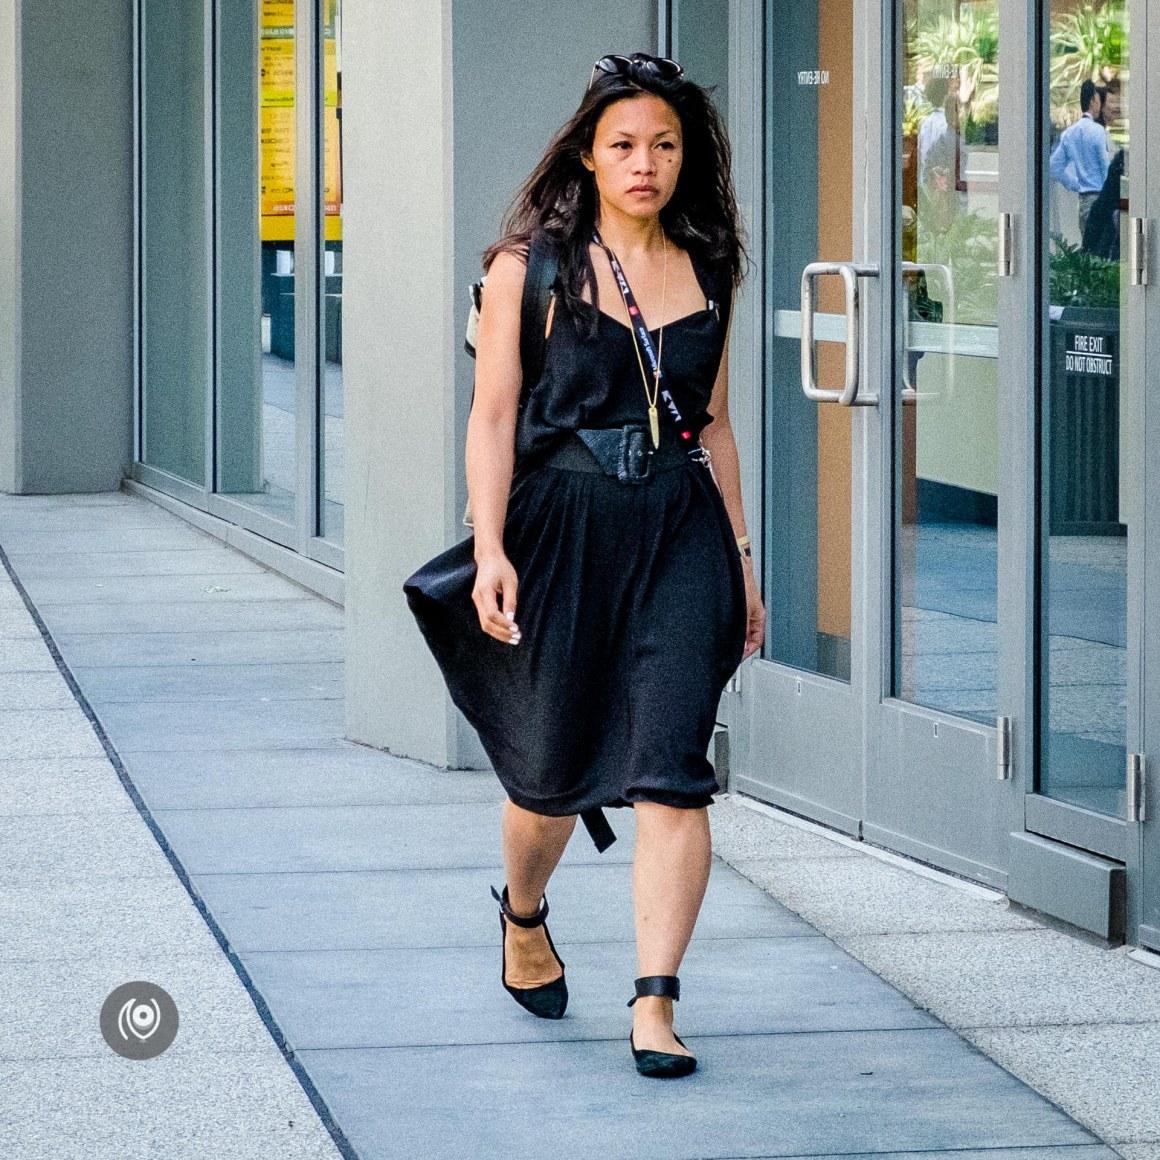 EyesForStreetStyle at Los Angeles #NAINAxADOBE #EyesForLA #AdobeMax15 Naina.co Luxury & Lifestyle, Photographer Storyteller, Blogger